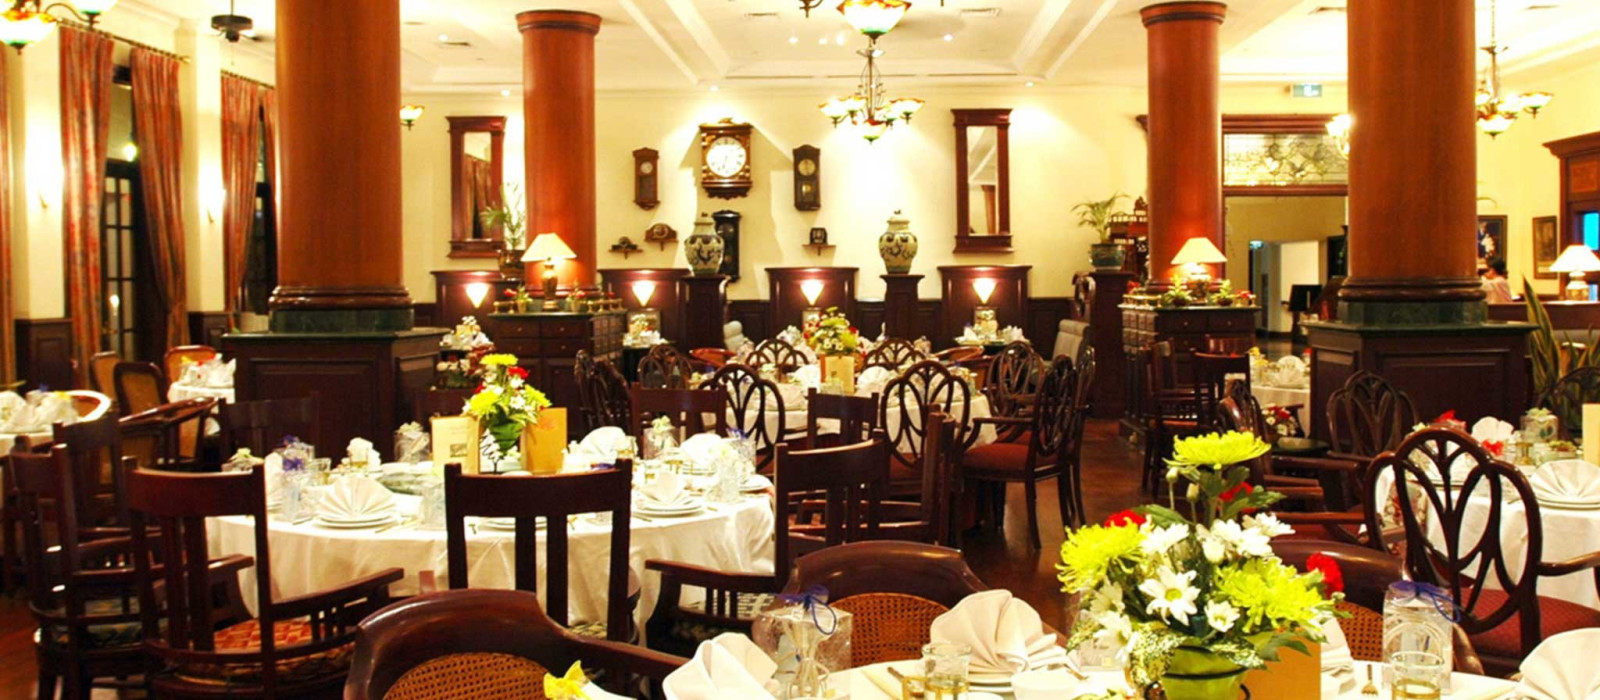 Hotel Majapahit  Surabaya Indonesien